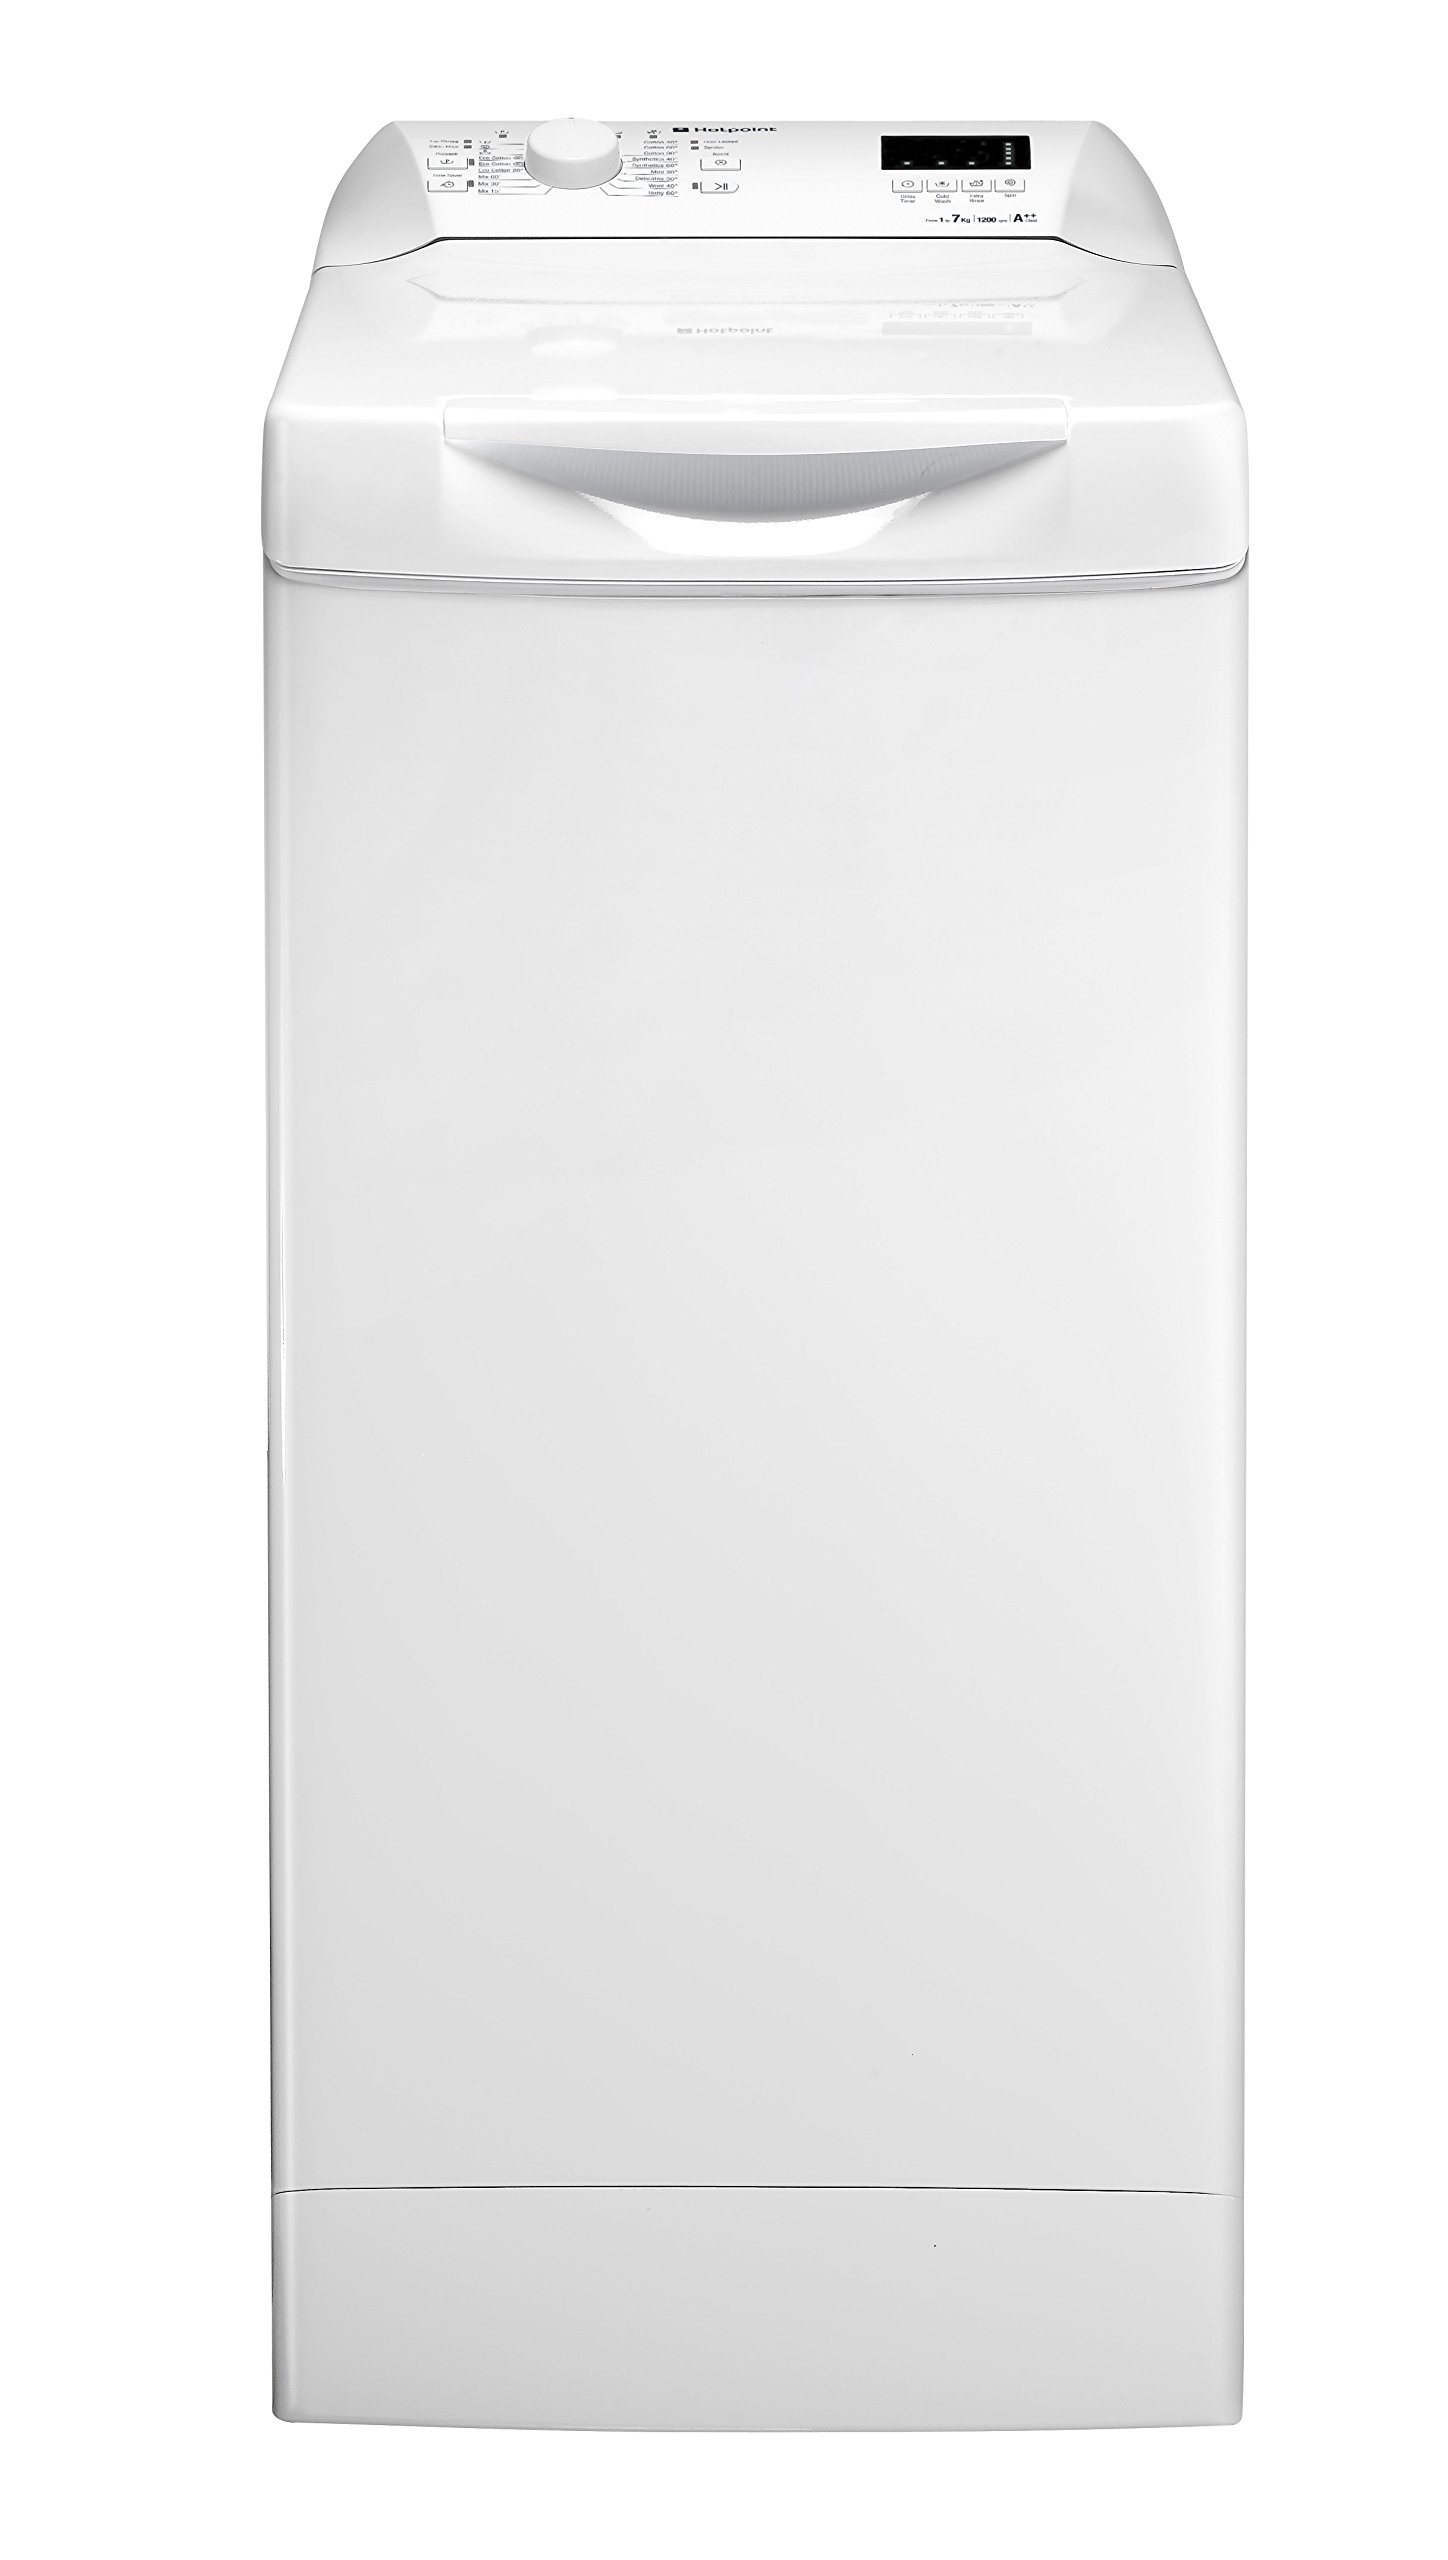 Hotpoint WMTF722H Aquarius 7kg 1200rpm Top Loading Freestanding Washing Machine - White [Energy Class A++]